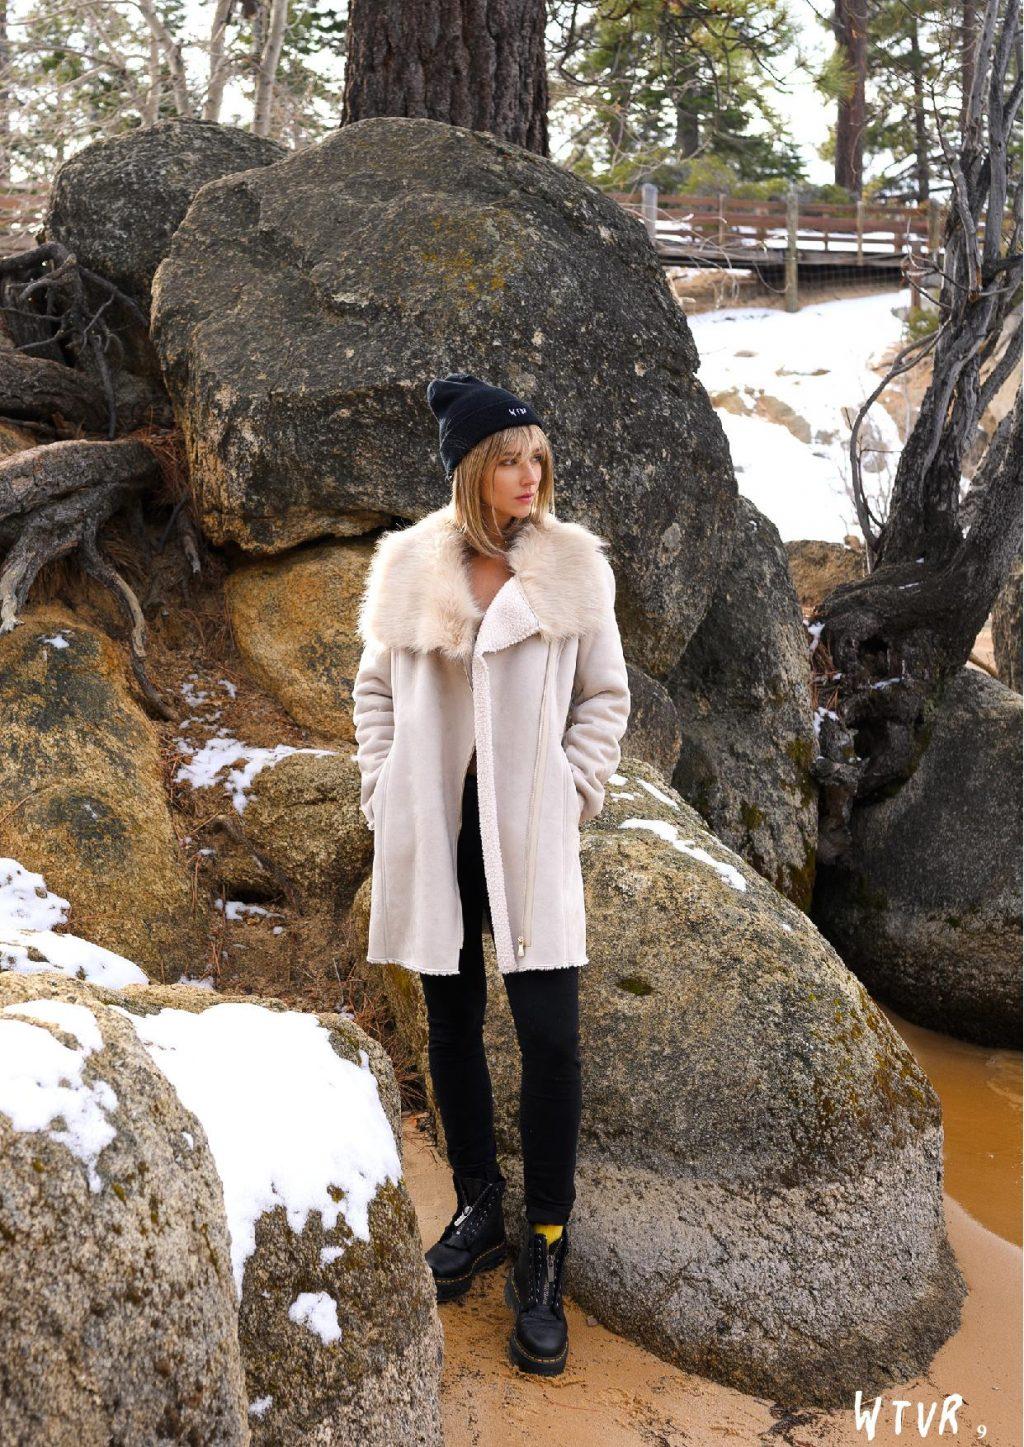 Rachel Cook, Alexis Rupp Nude – WTVR Magazine №3 (42 Photos)